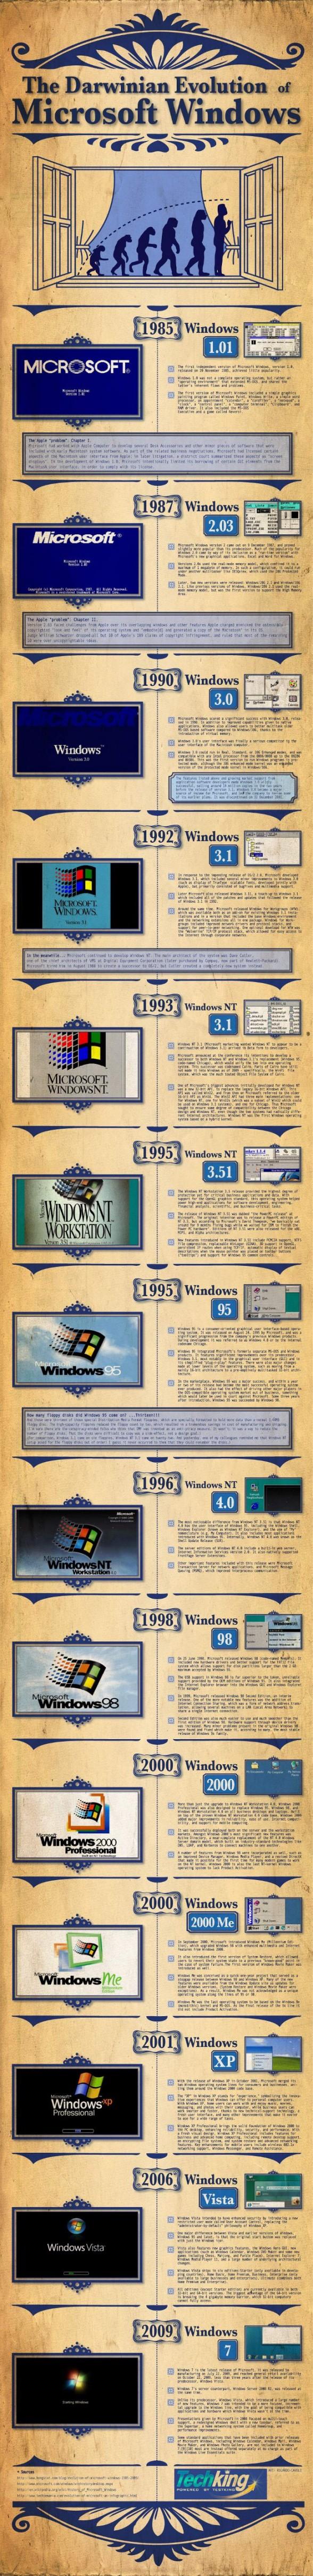 Evolution de Microsoft